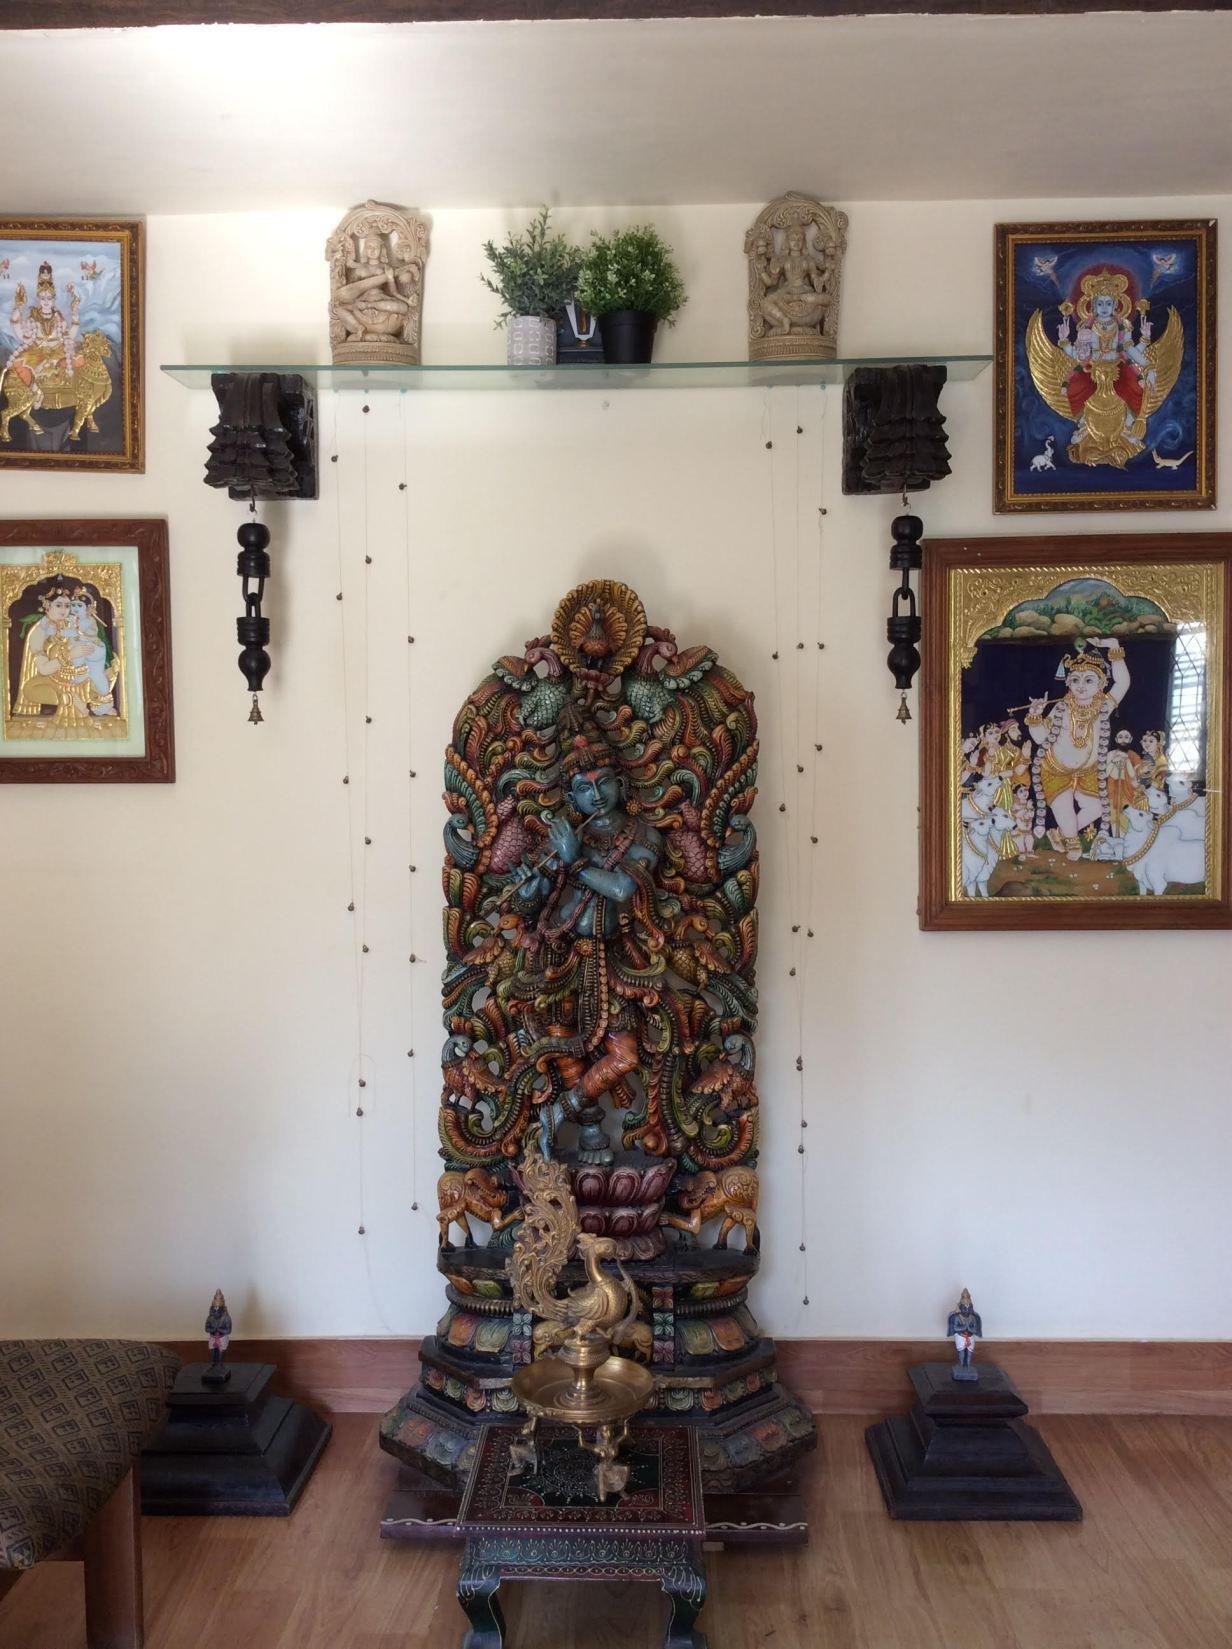 Room shalu15 shalu15 Indian decor